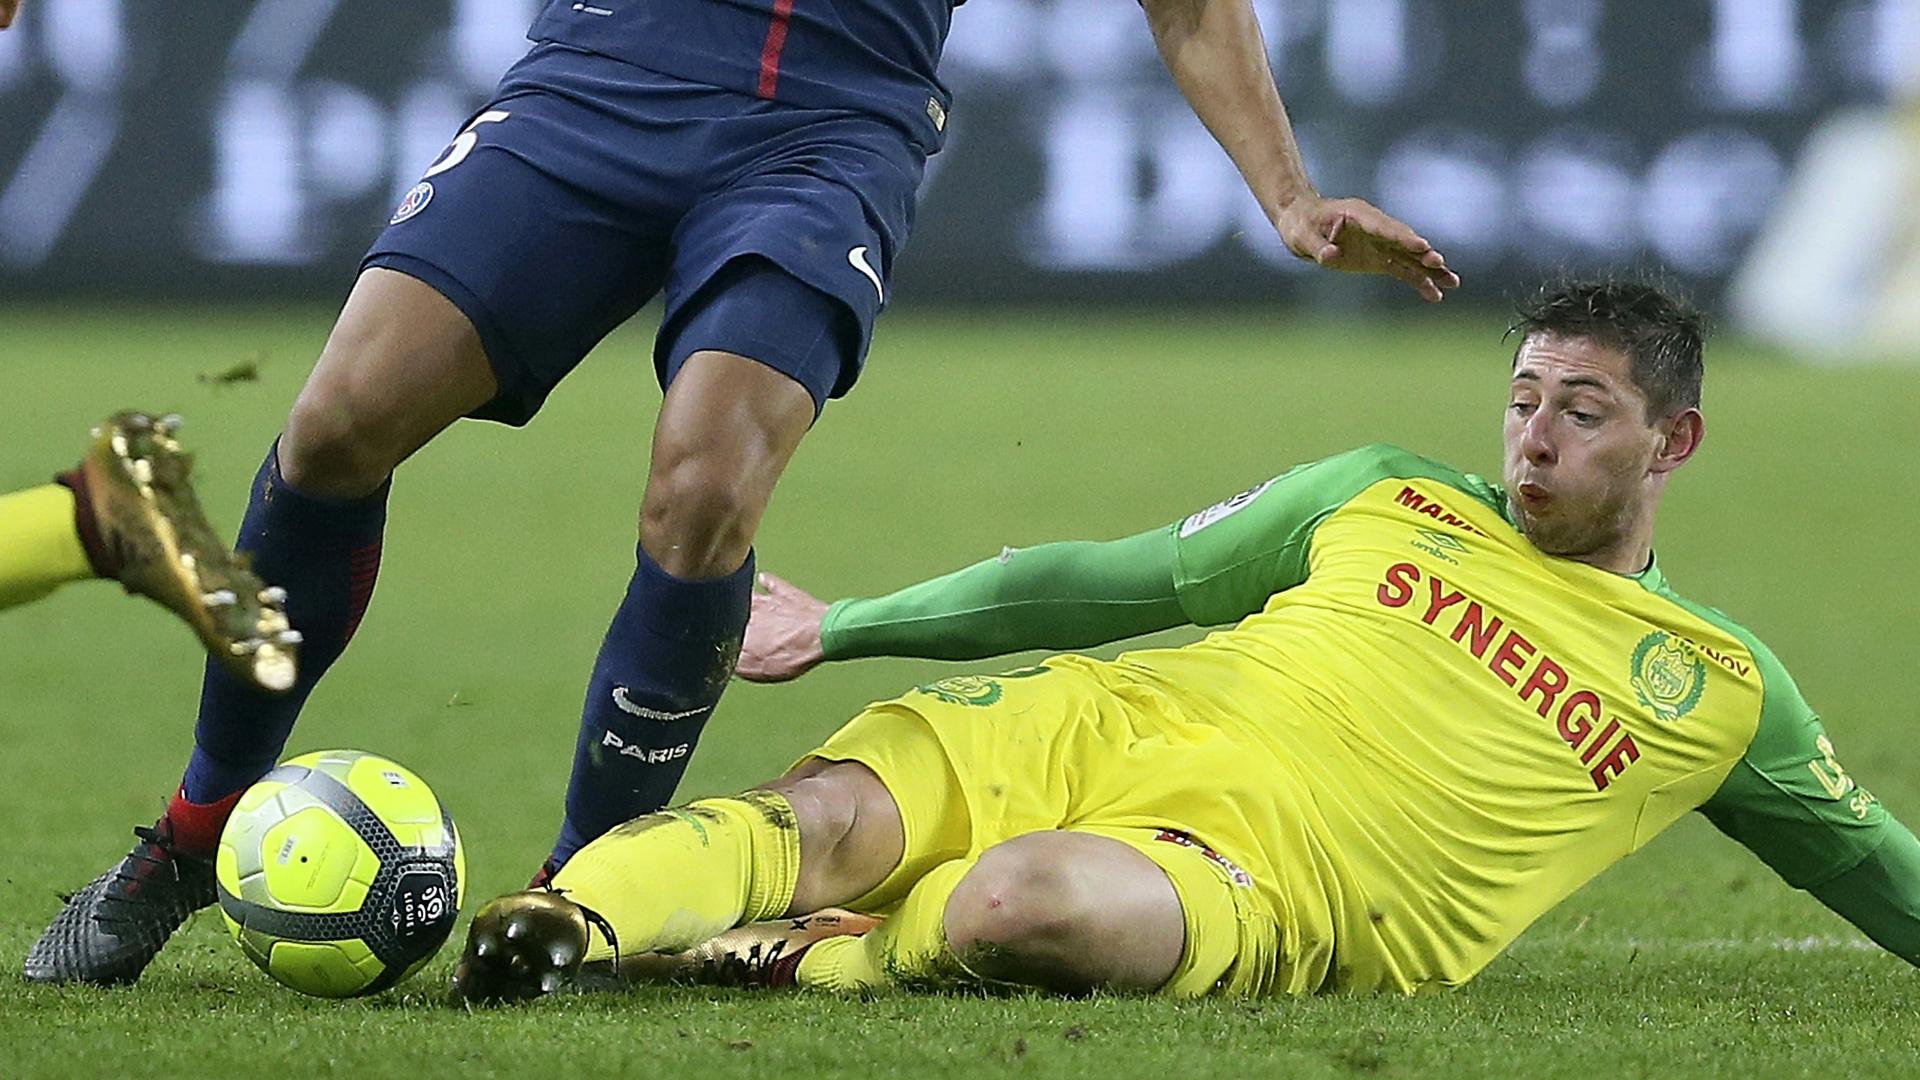 Recuerdan la grandeza del futbolista Emiliano Sala